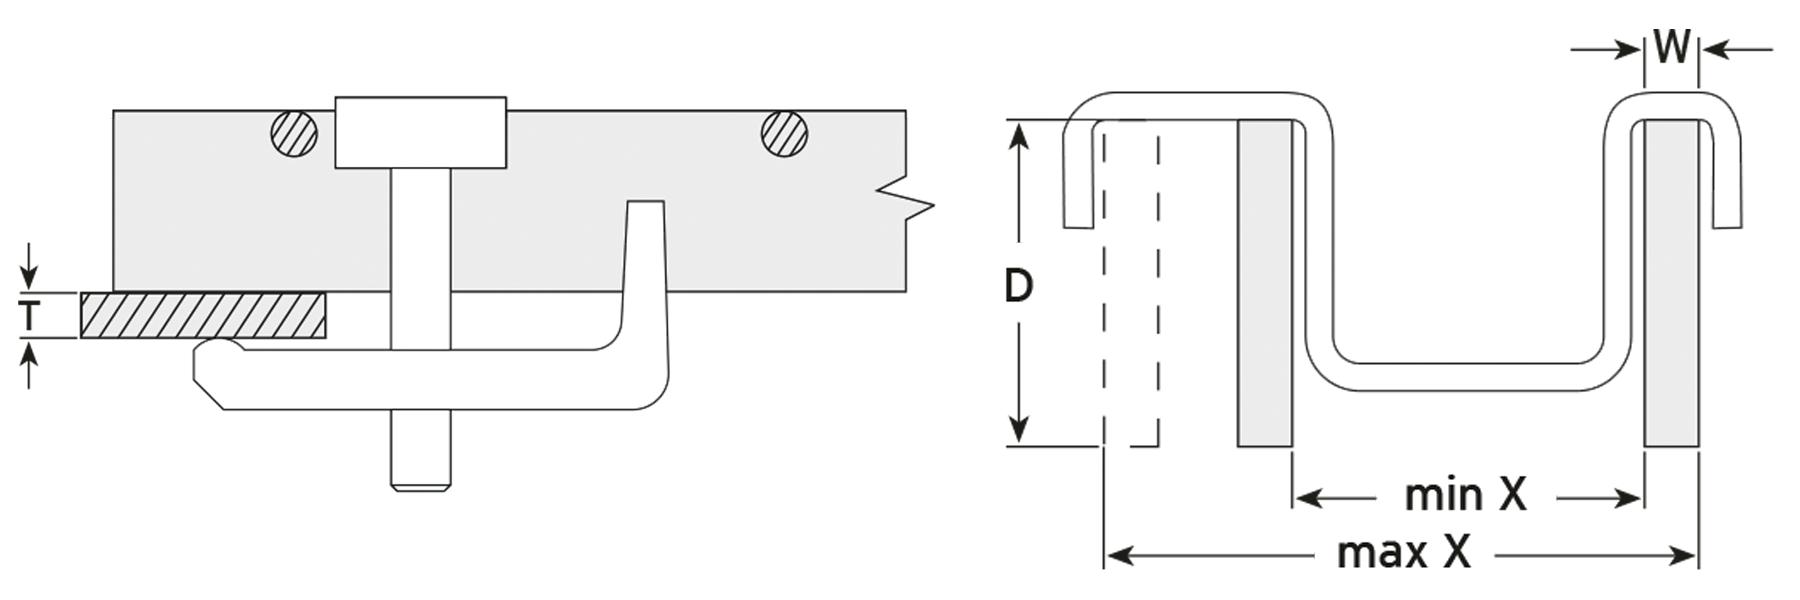 Lindapter GF Clip Installation Drawing